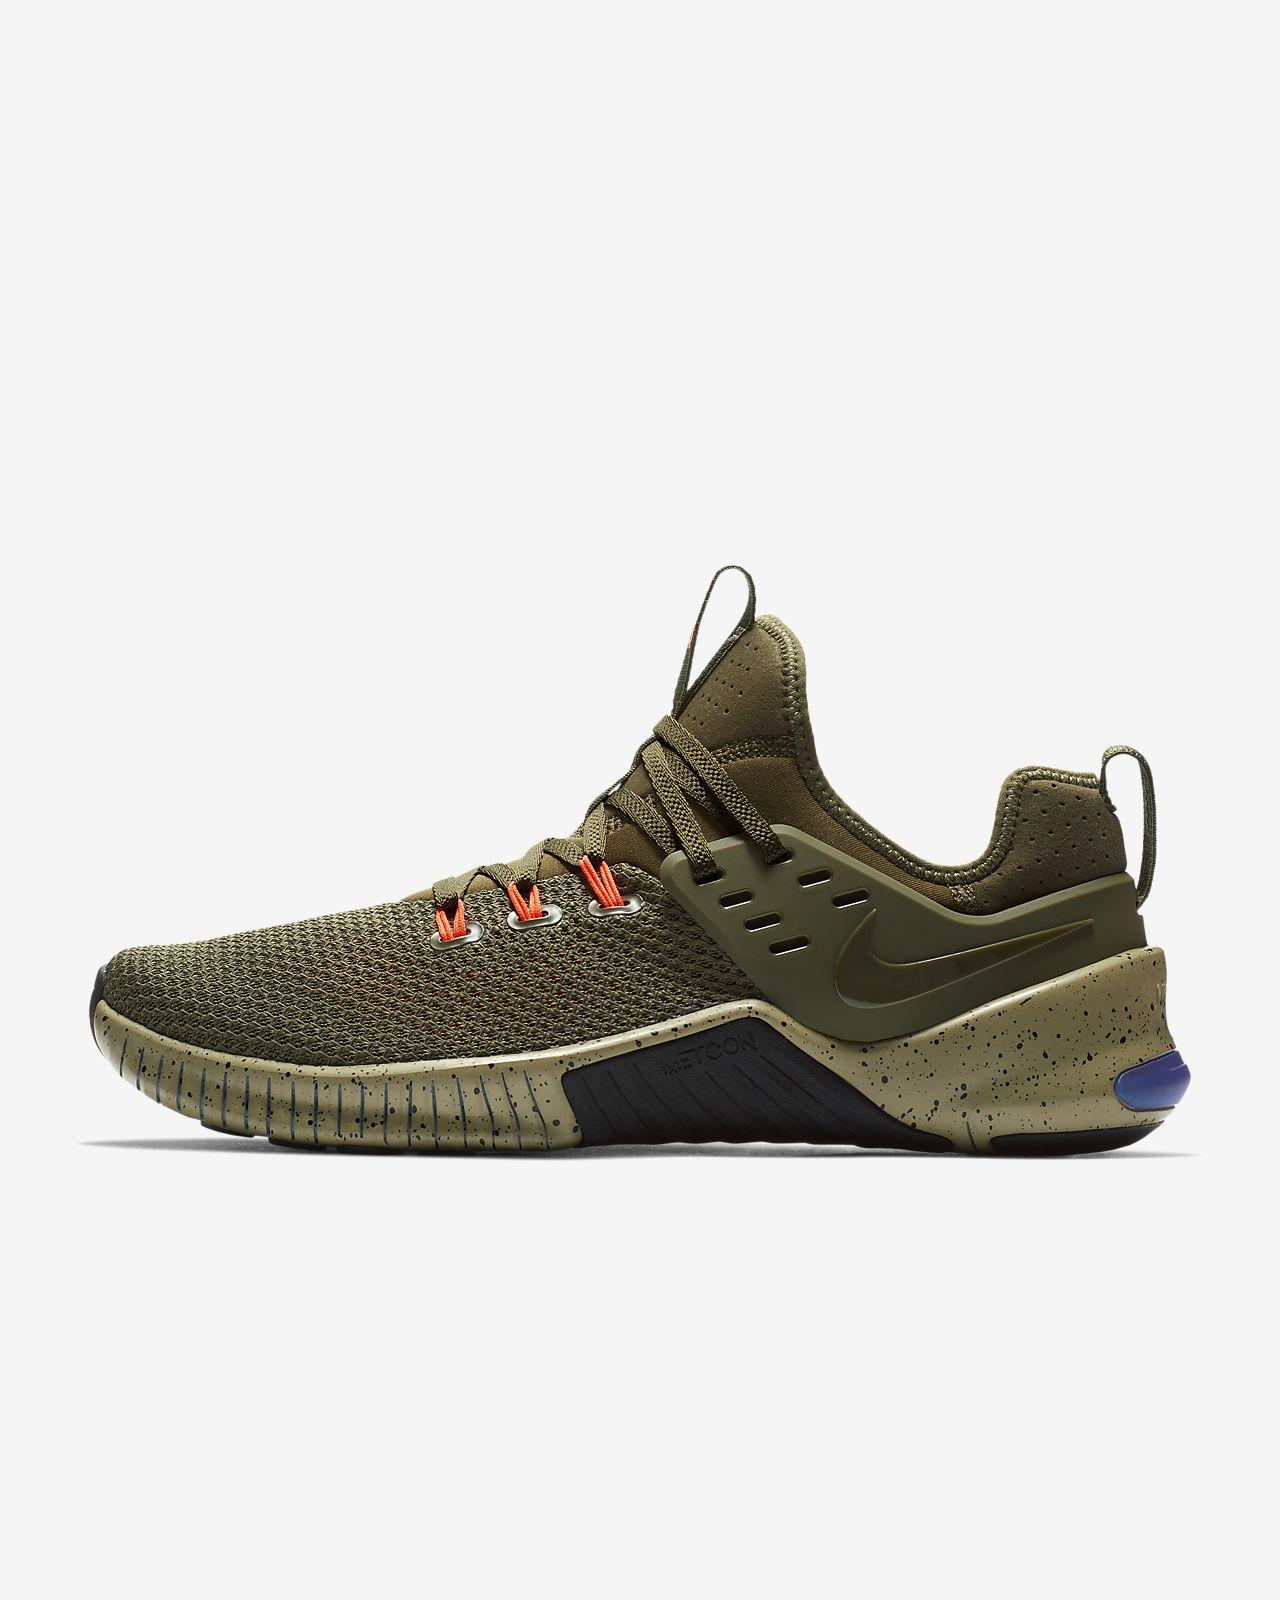 Chaussure de cross-training et de renforcement musculaire Nike Free x Metcon 925108f45408